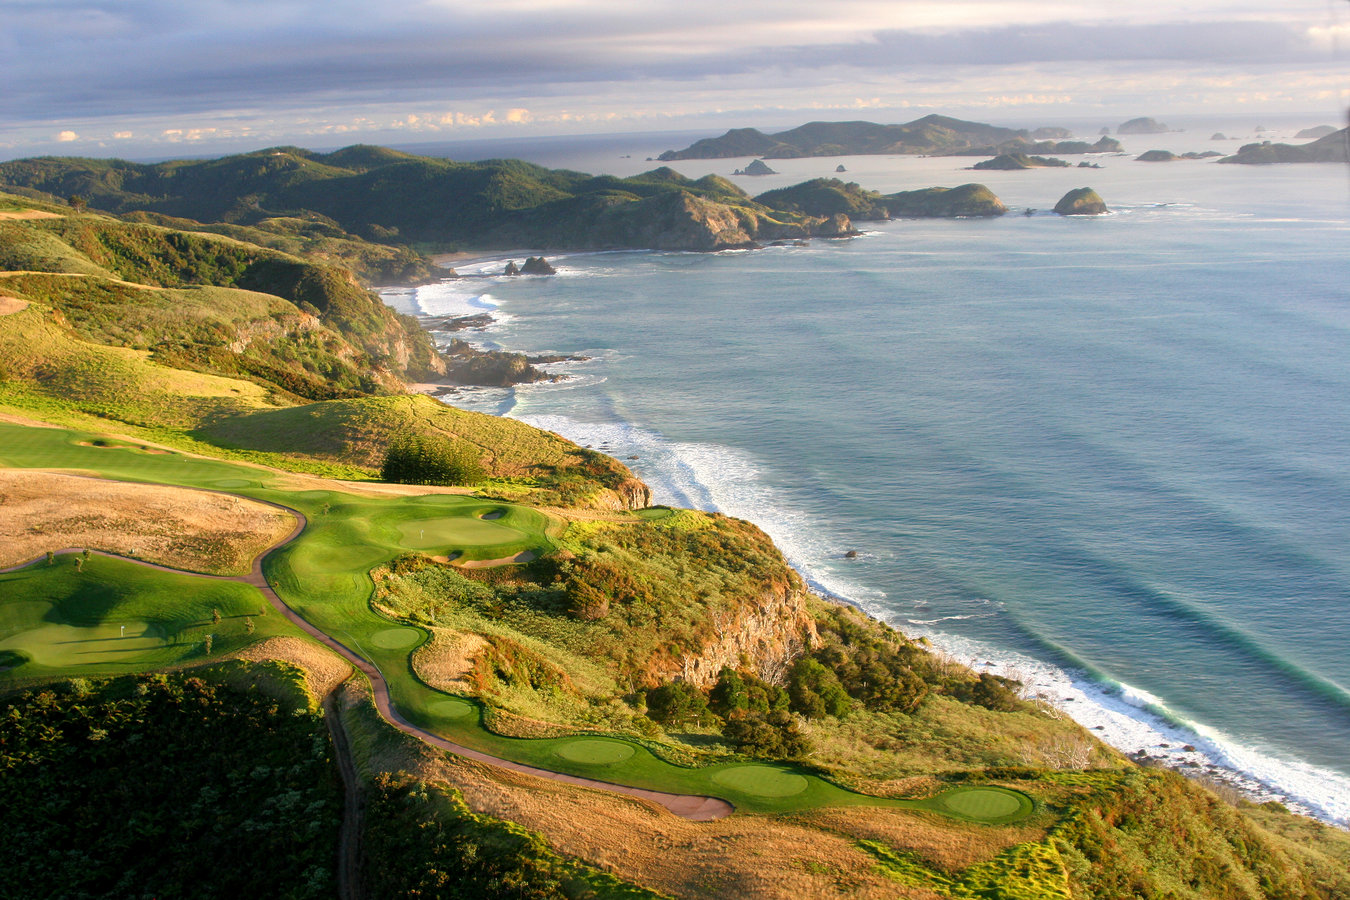 Kauri Cliffs Golf Course - 18 Hole Par 72 Championship Course - Foto by The A Position   James McAfee